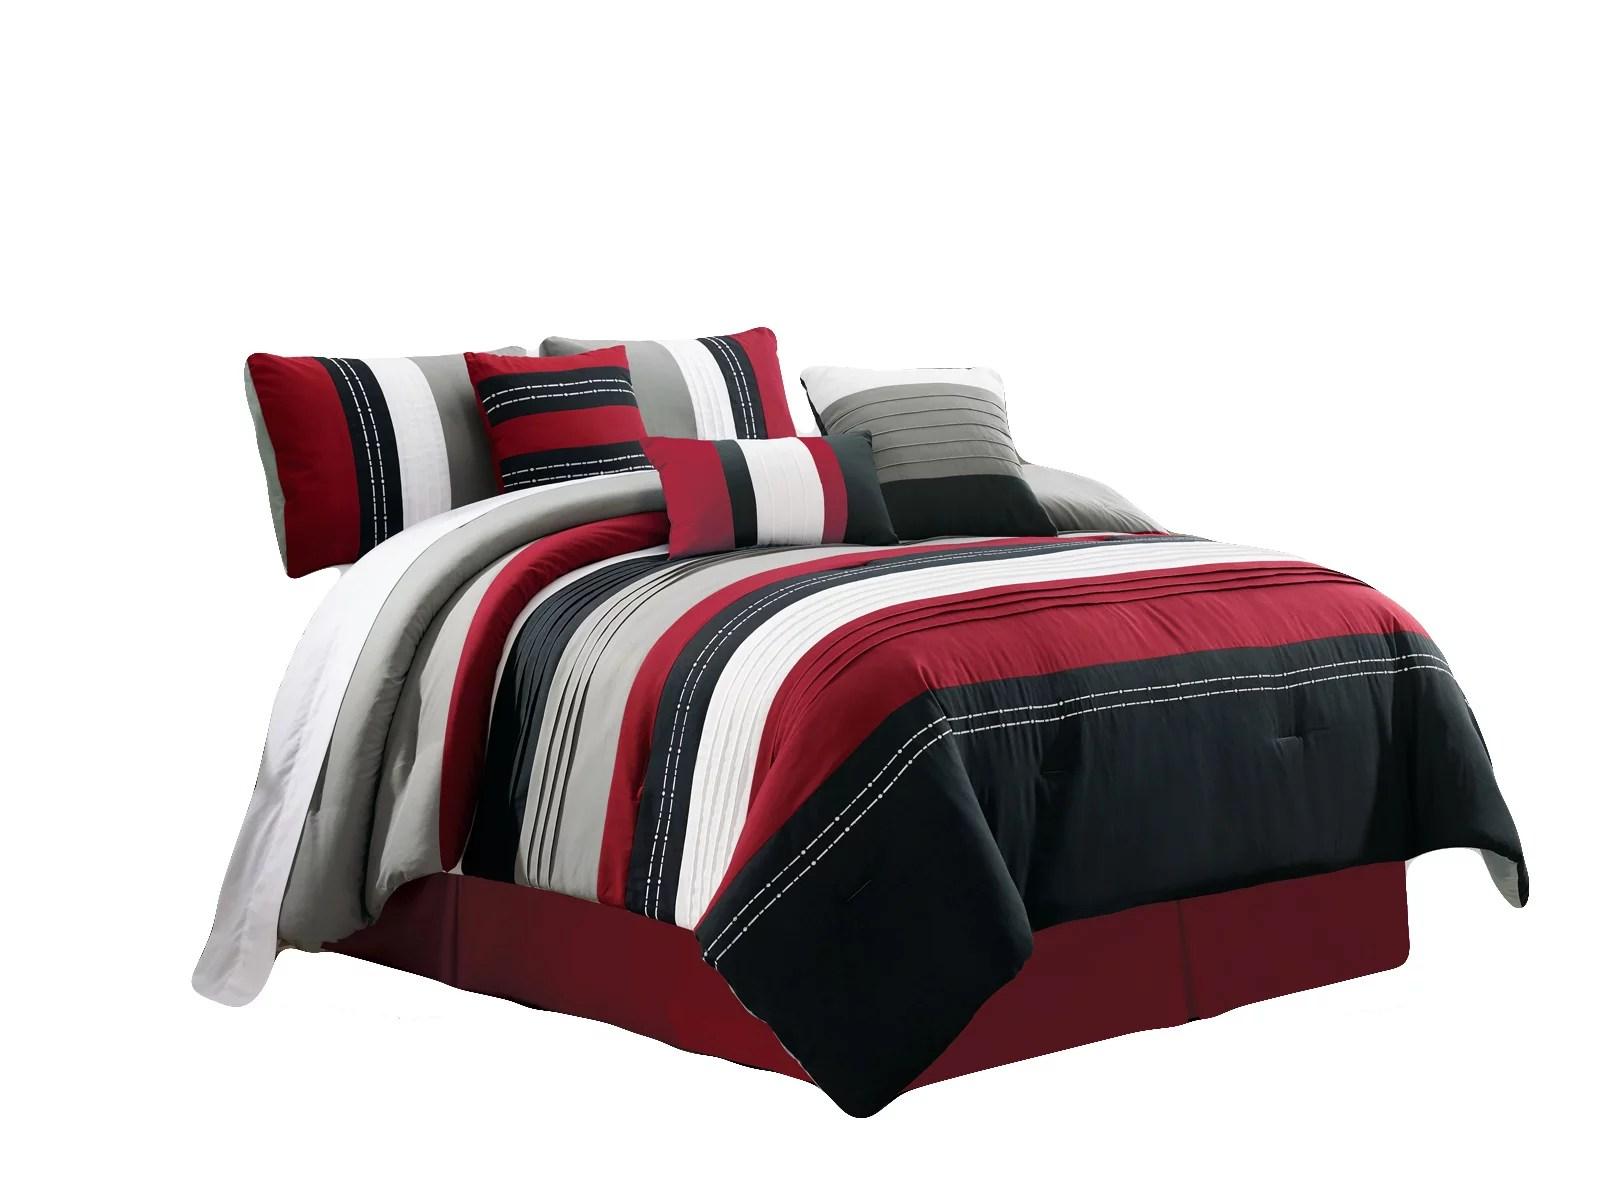 7 pc jordan embroidery pleated stripe lines comforter set burgundy black white gray queen